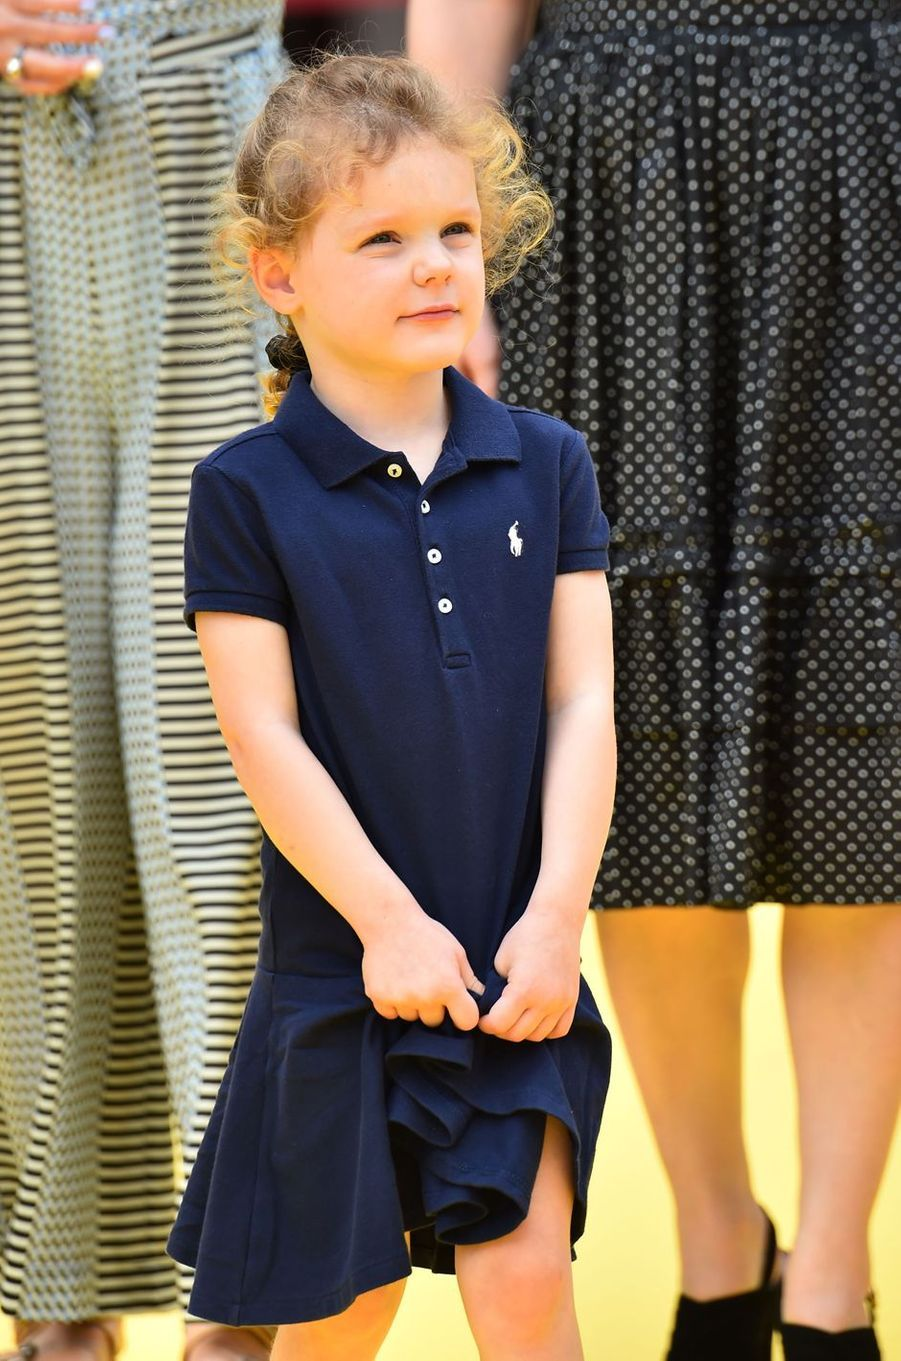 La princesse Gabriella de Monaco à Monaco, le 16 juin 2019